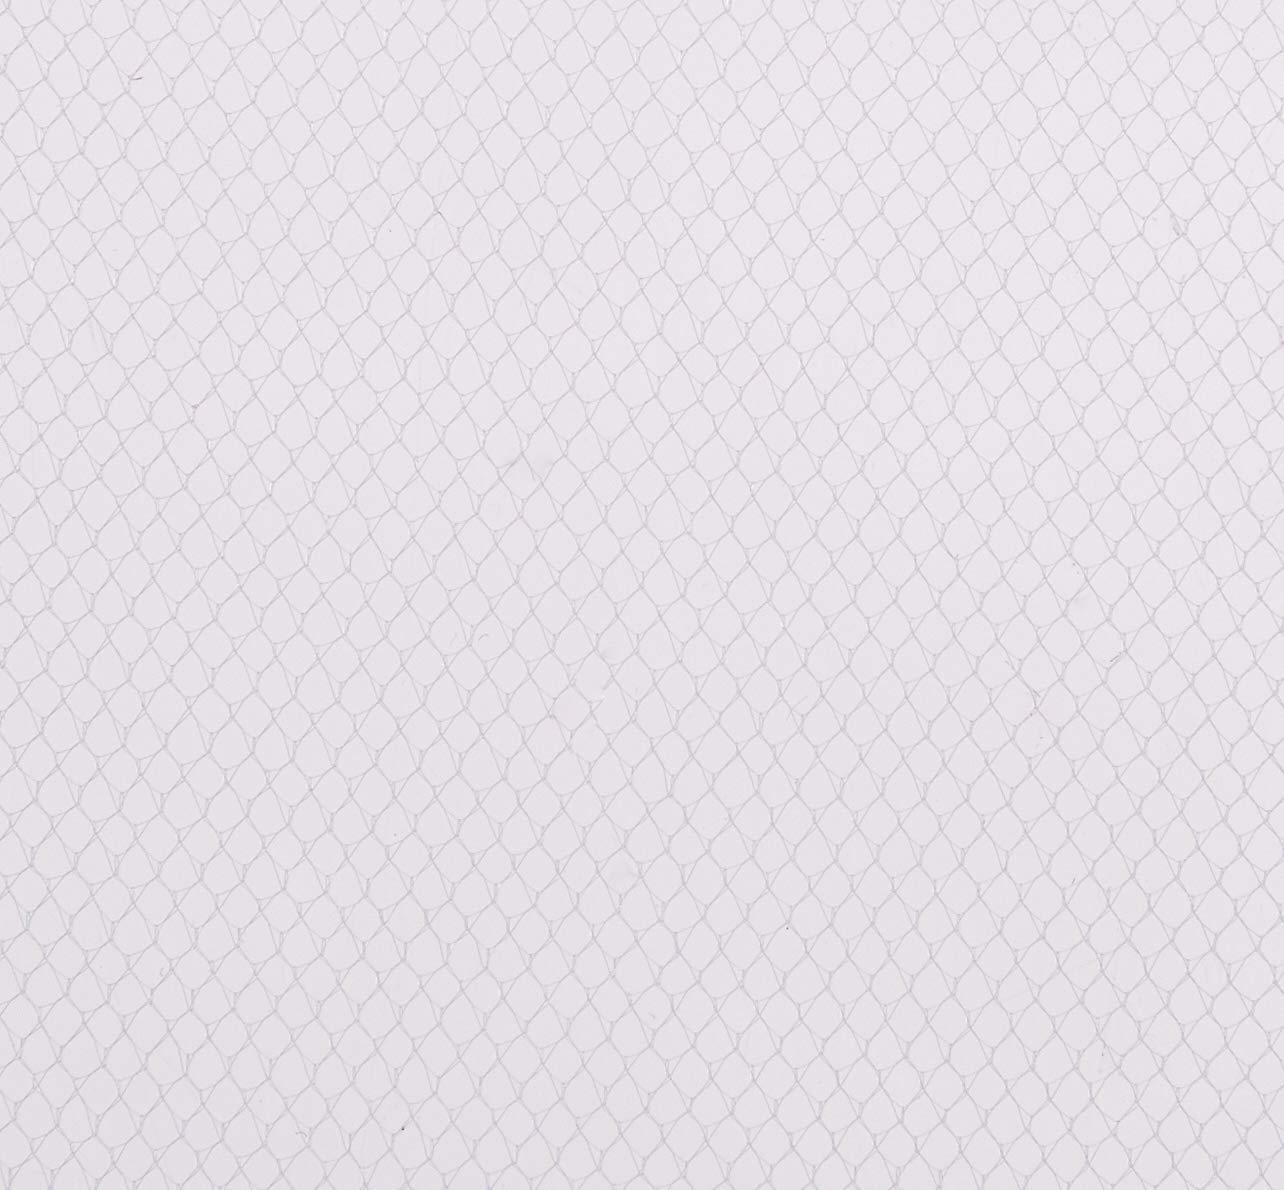 X100 WHITE CROCHET HEADBANDS SUPER SOFT STRETCHY HAIRBAND